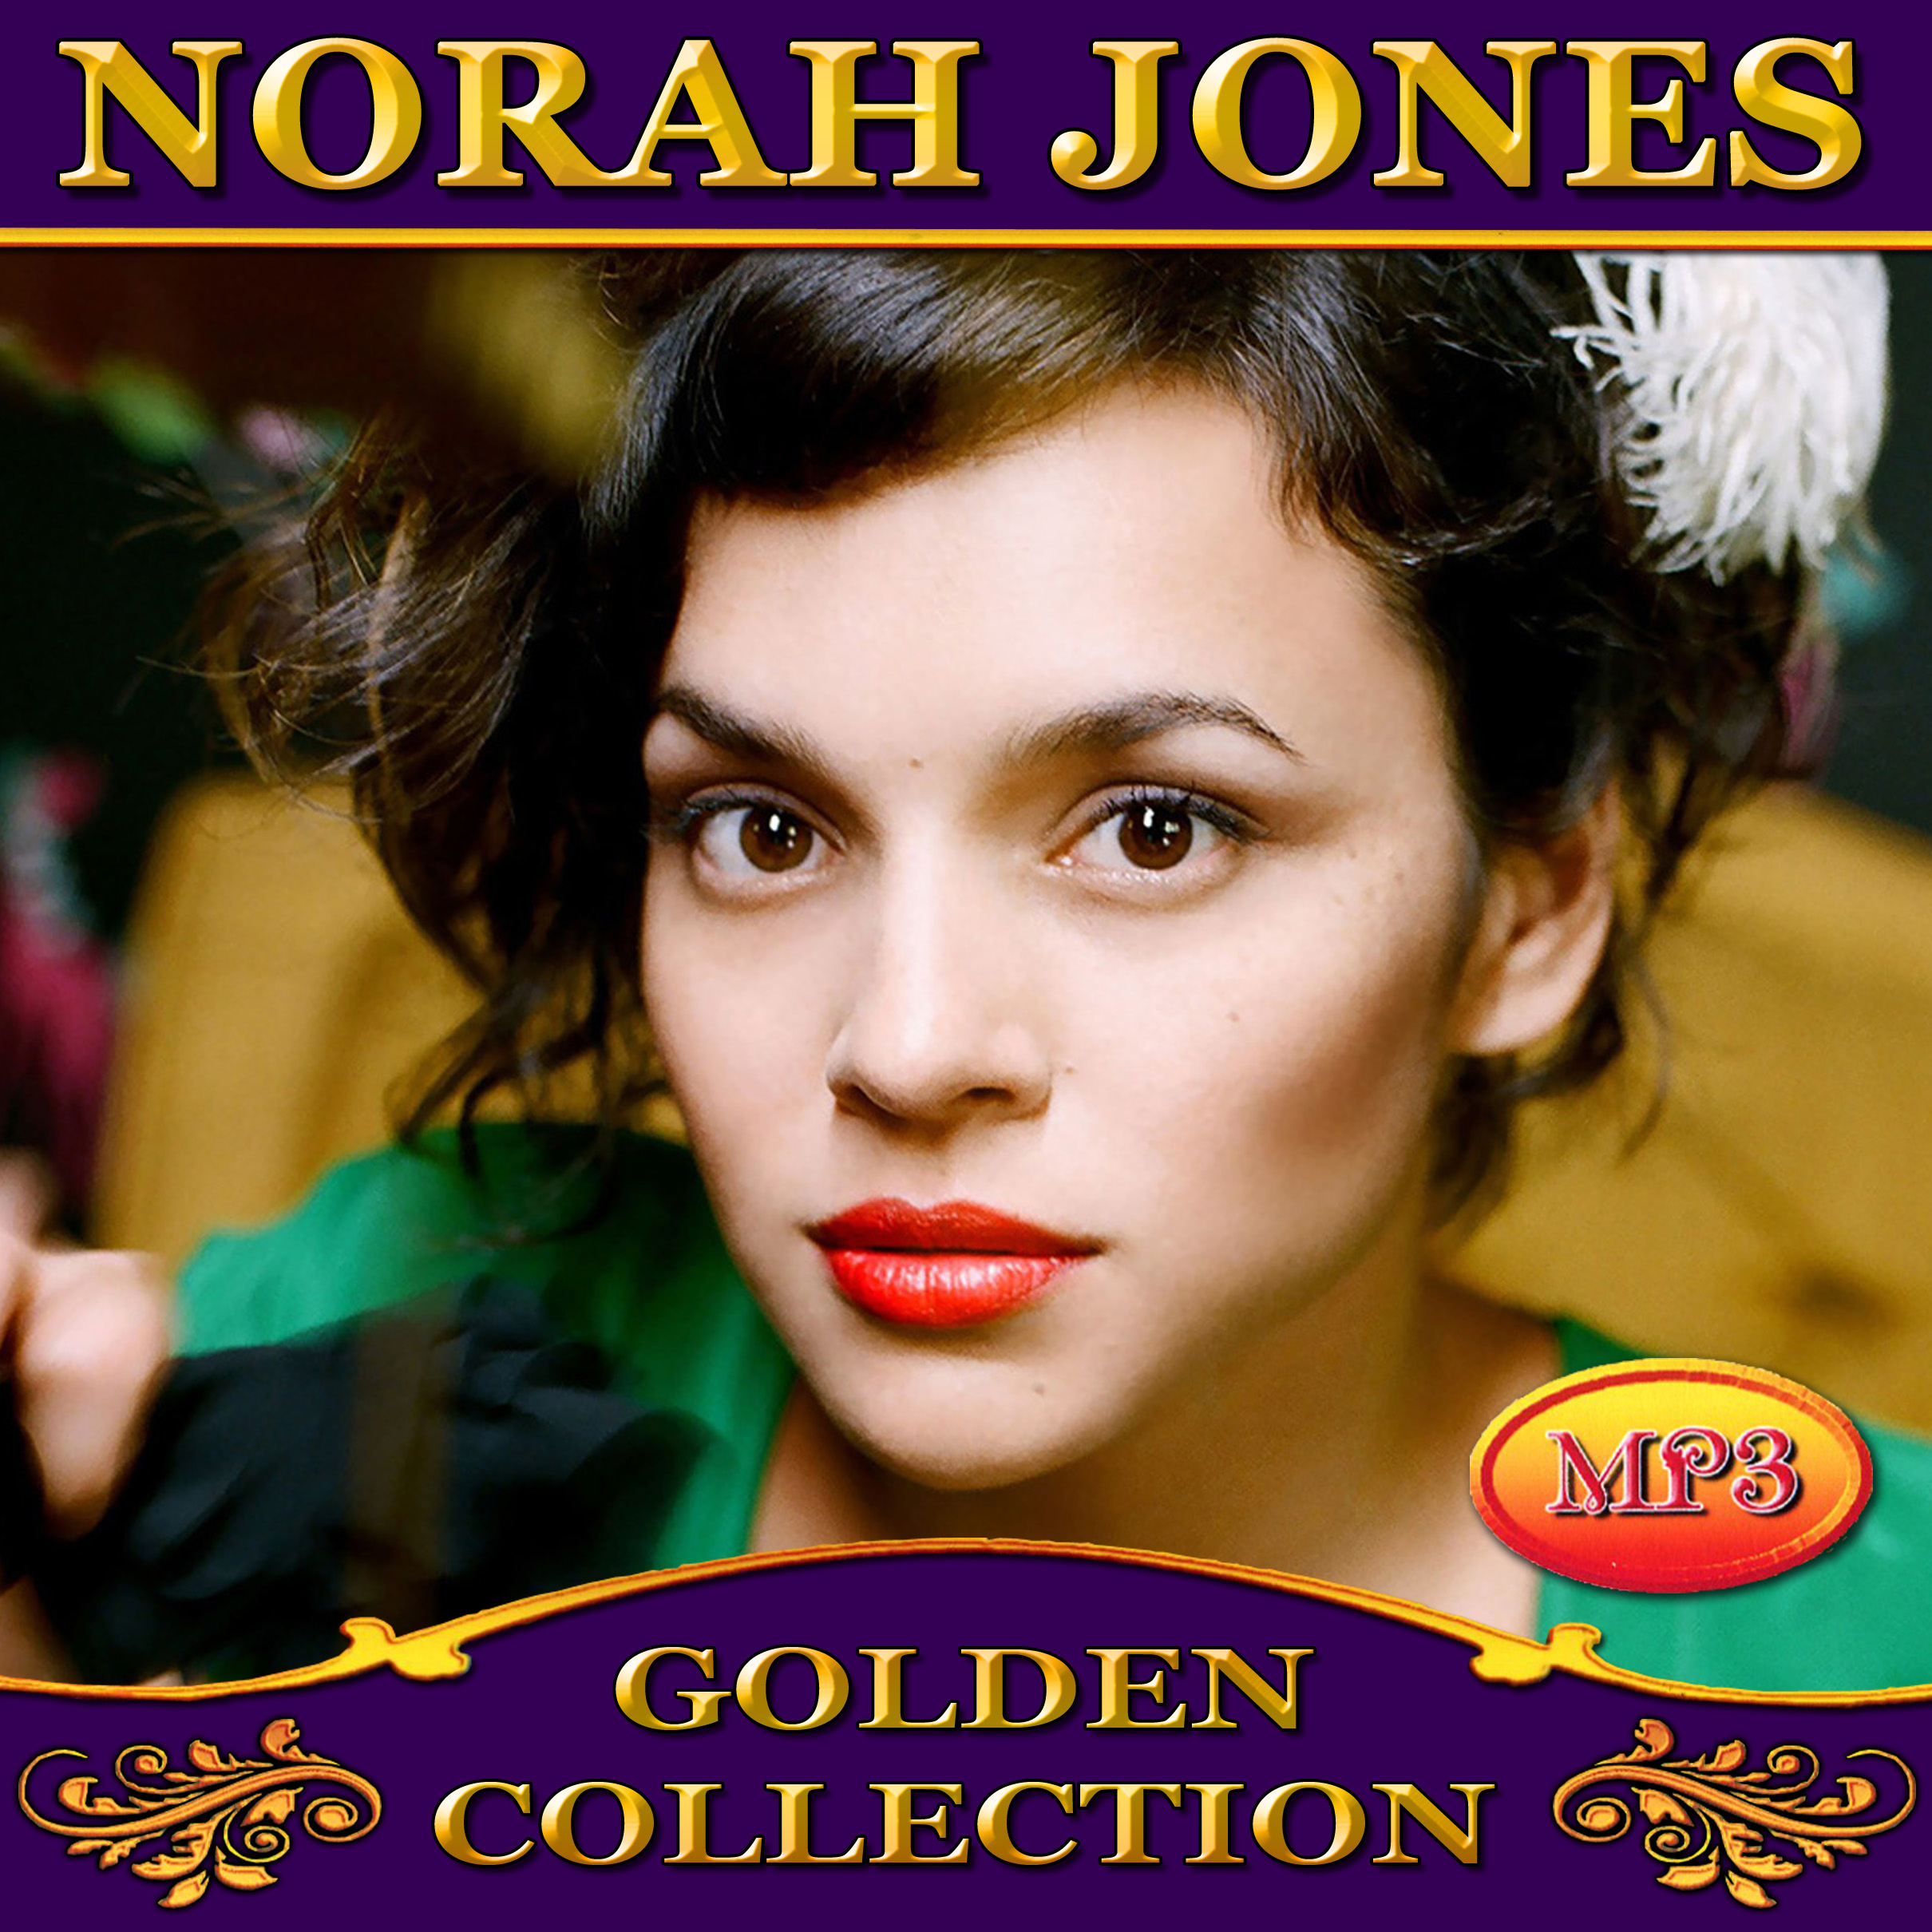 Norah Jones [mp3]